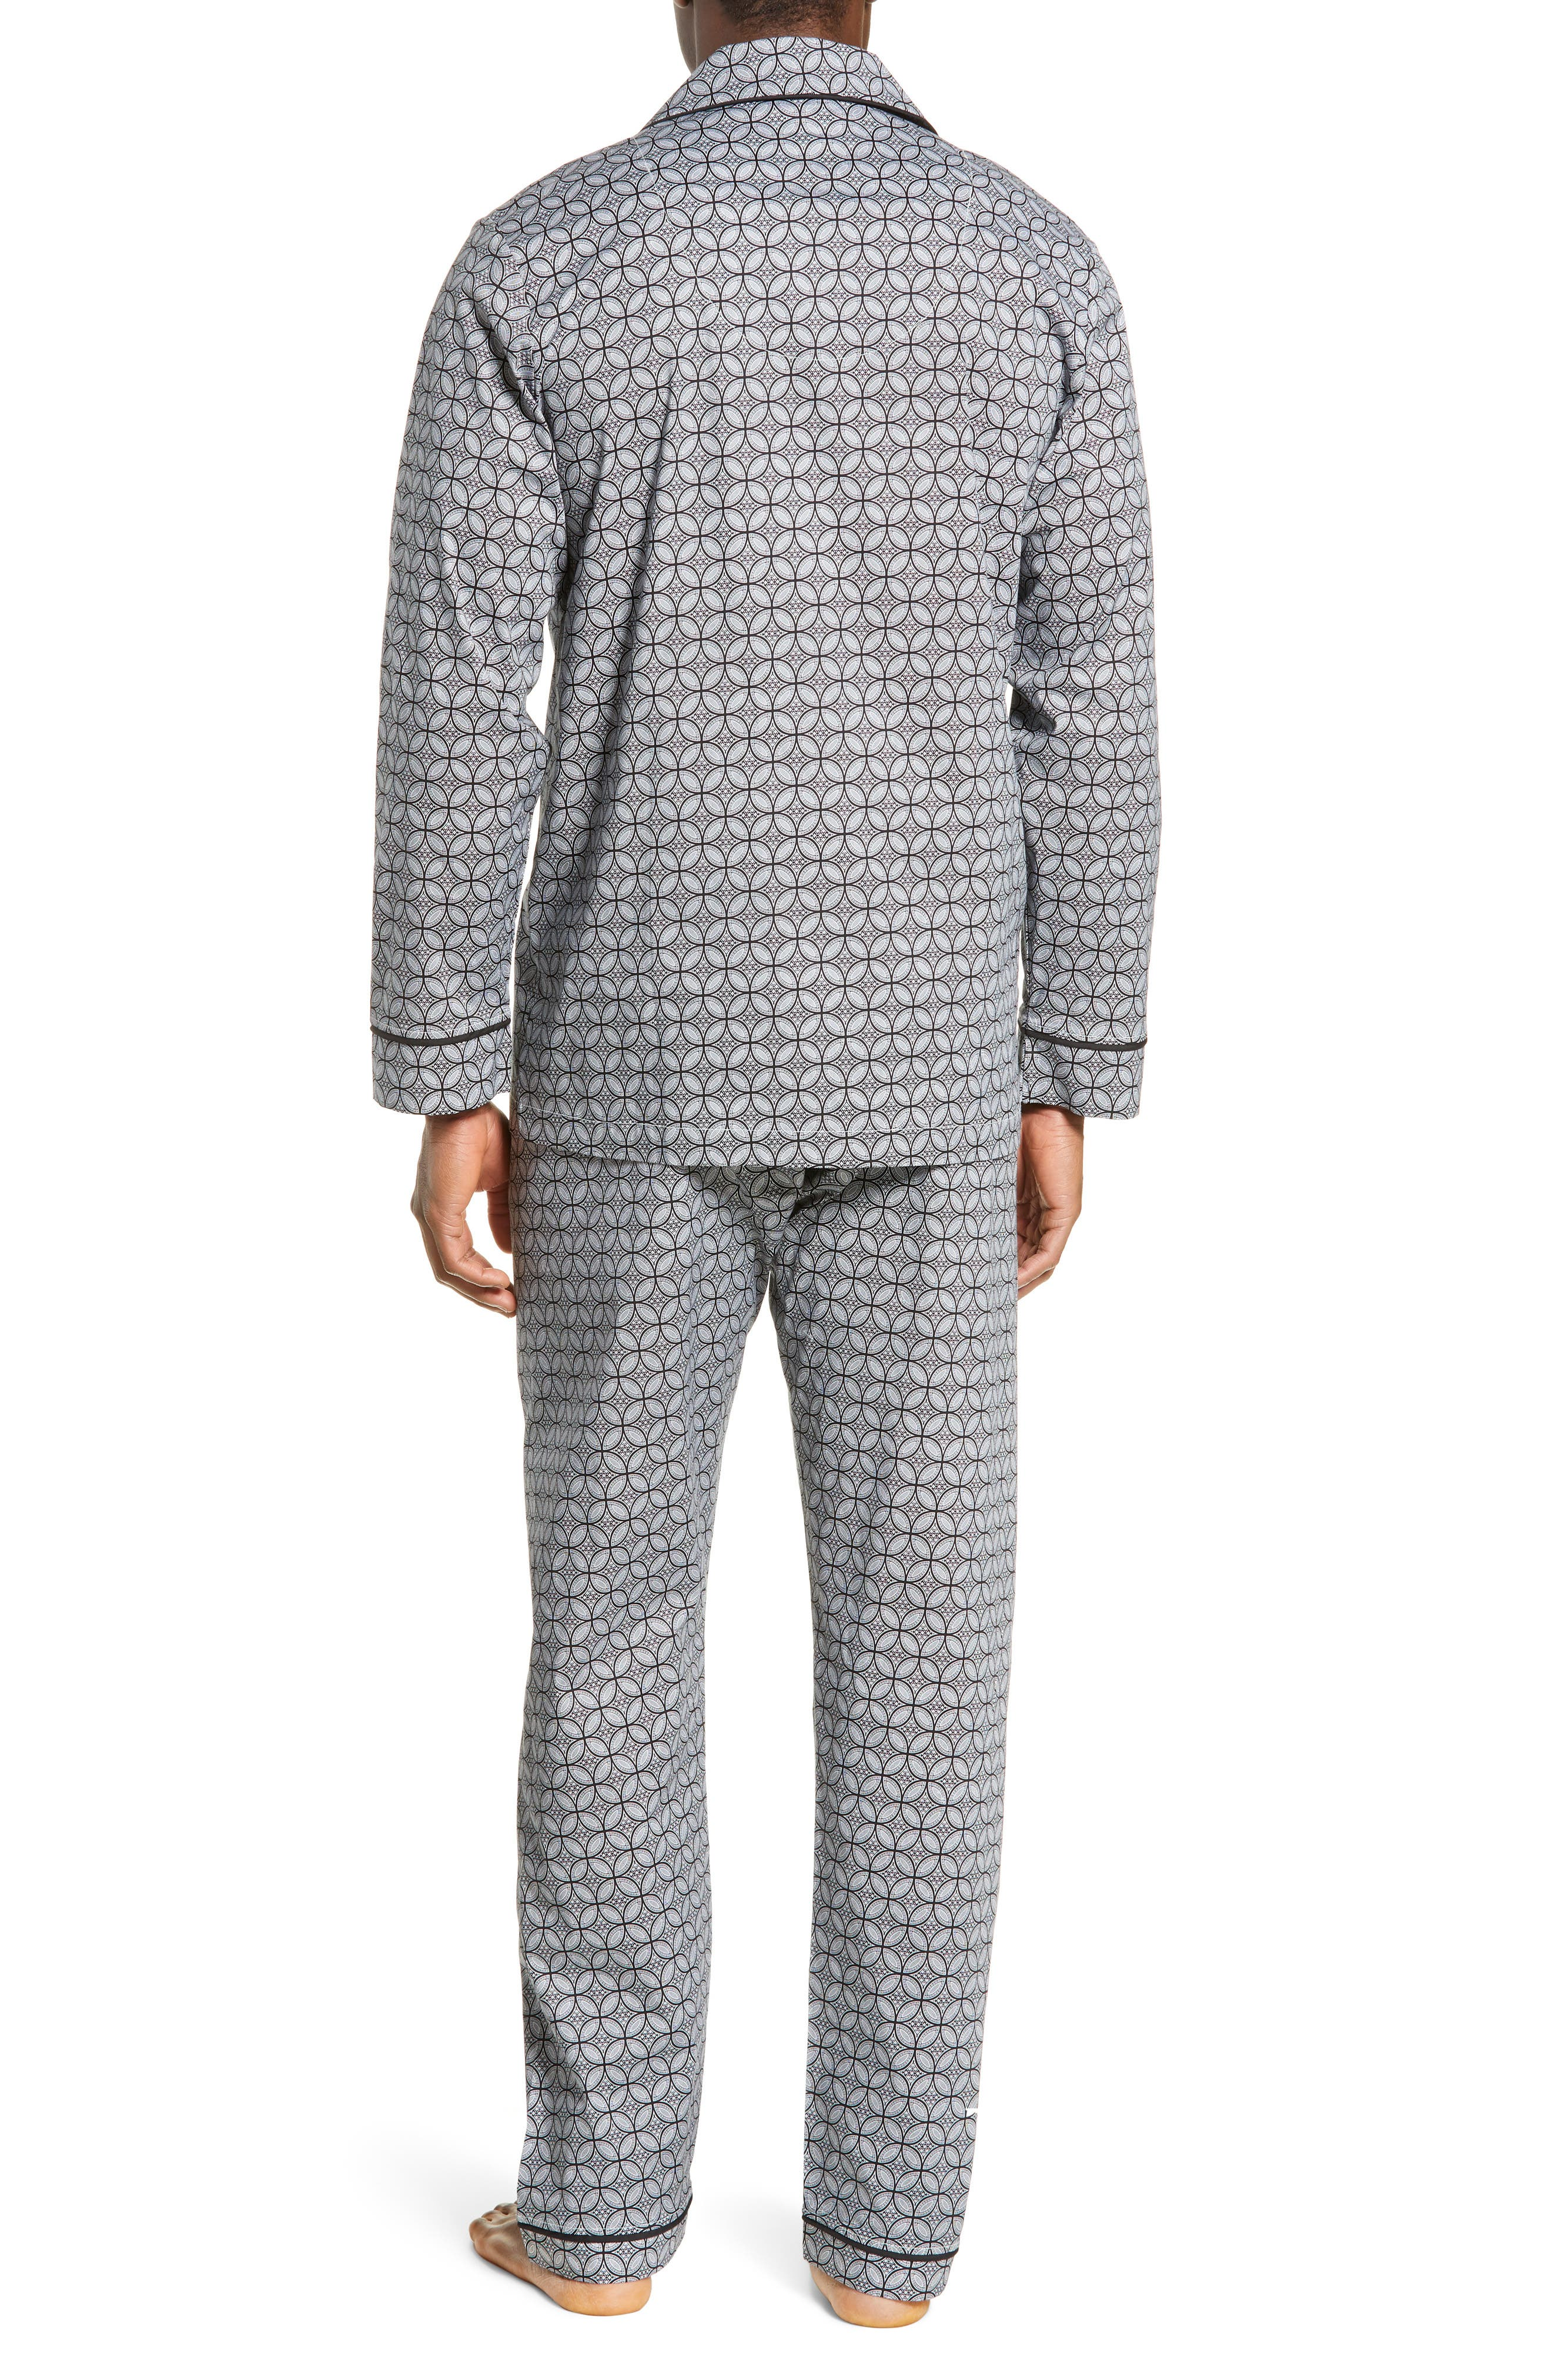 MAJESTIC INTERNATIONAL, Marbella Stretch Sateen Pajamas, Alternate thumbnail 2, color, BLACK